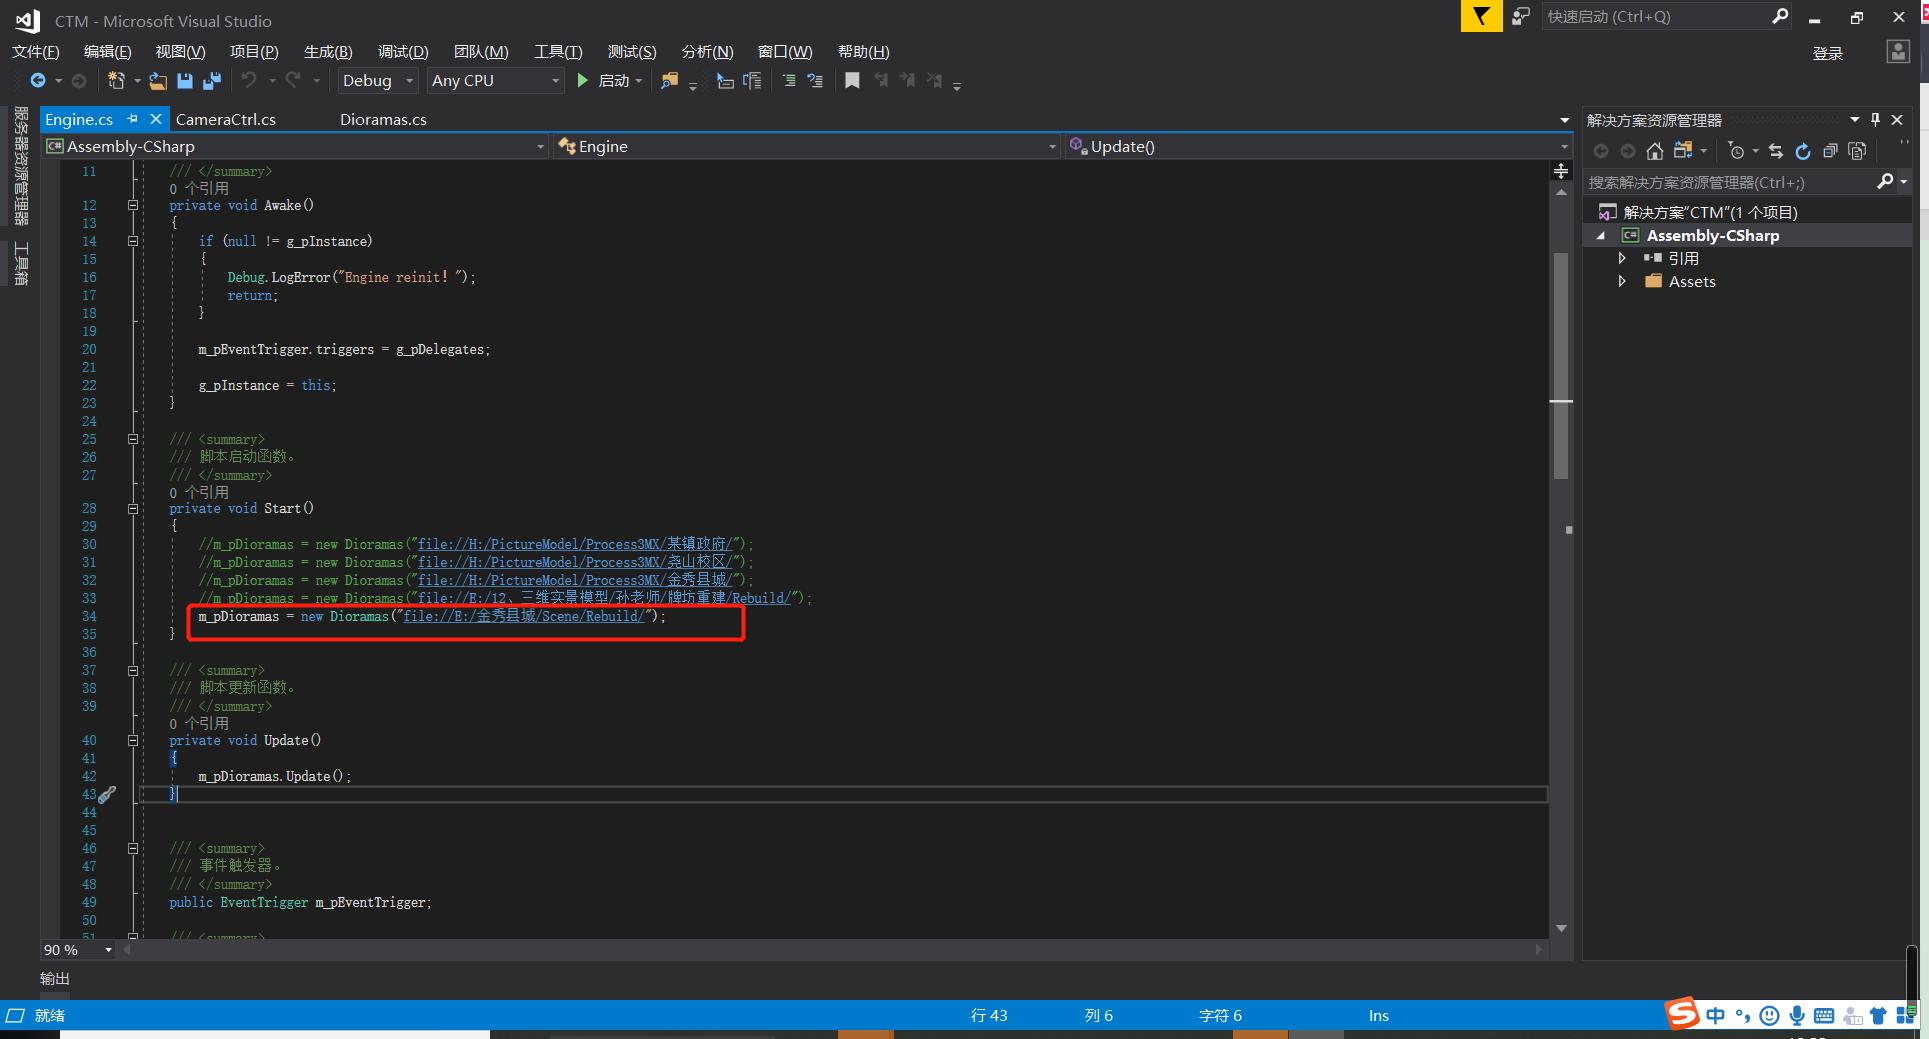 cs脚本对象挂载到一个资源对象,并在new 倾斜摄影对象时传入文件路径